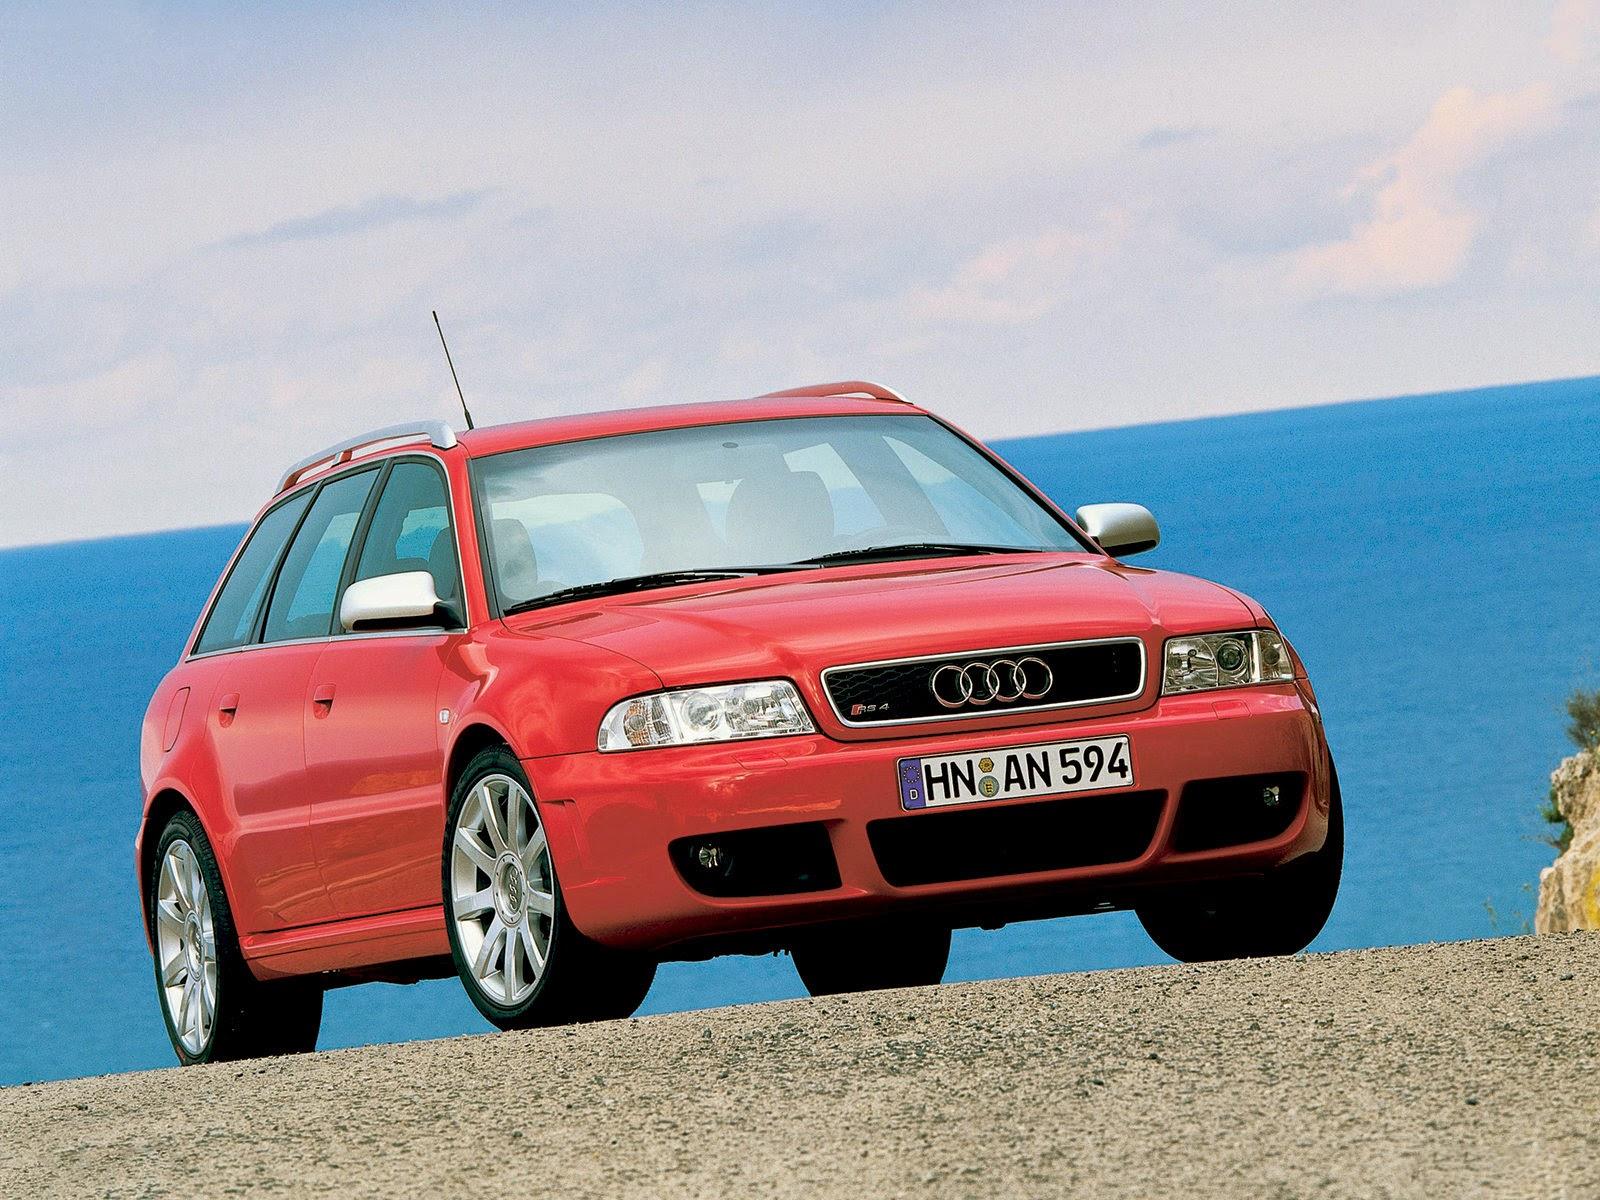 Audi RS 4 I (B5) 2000 - 2001 Station wagon 5 door #6